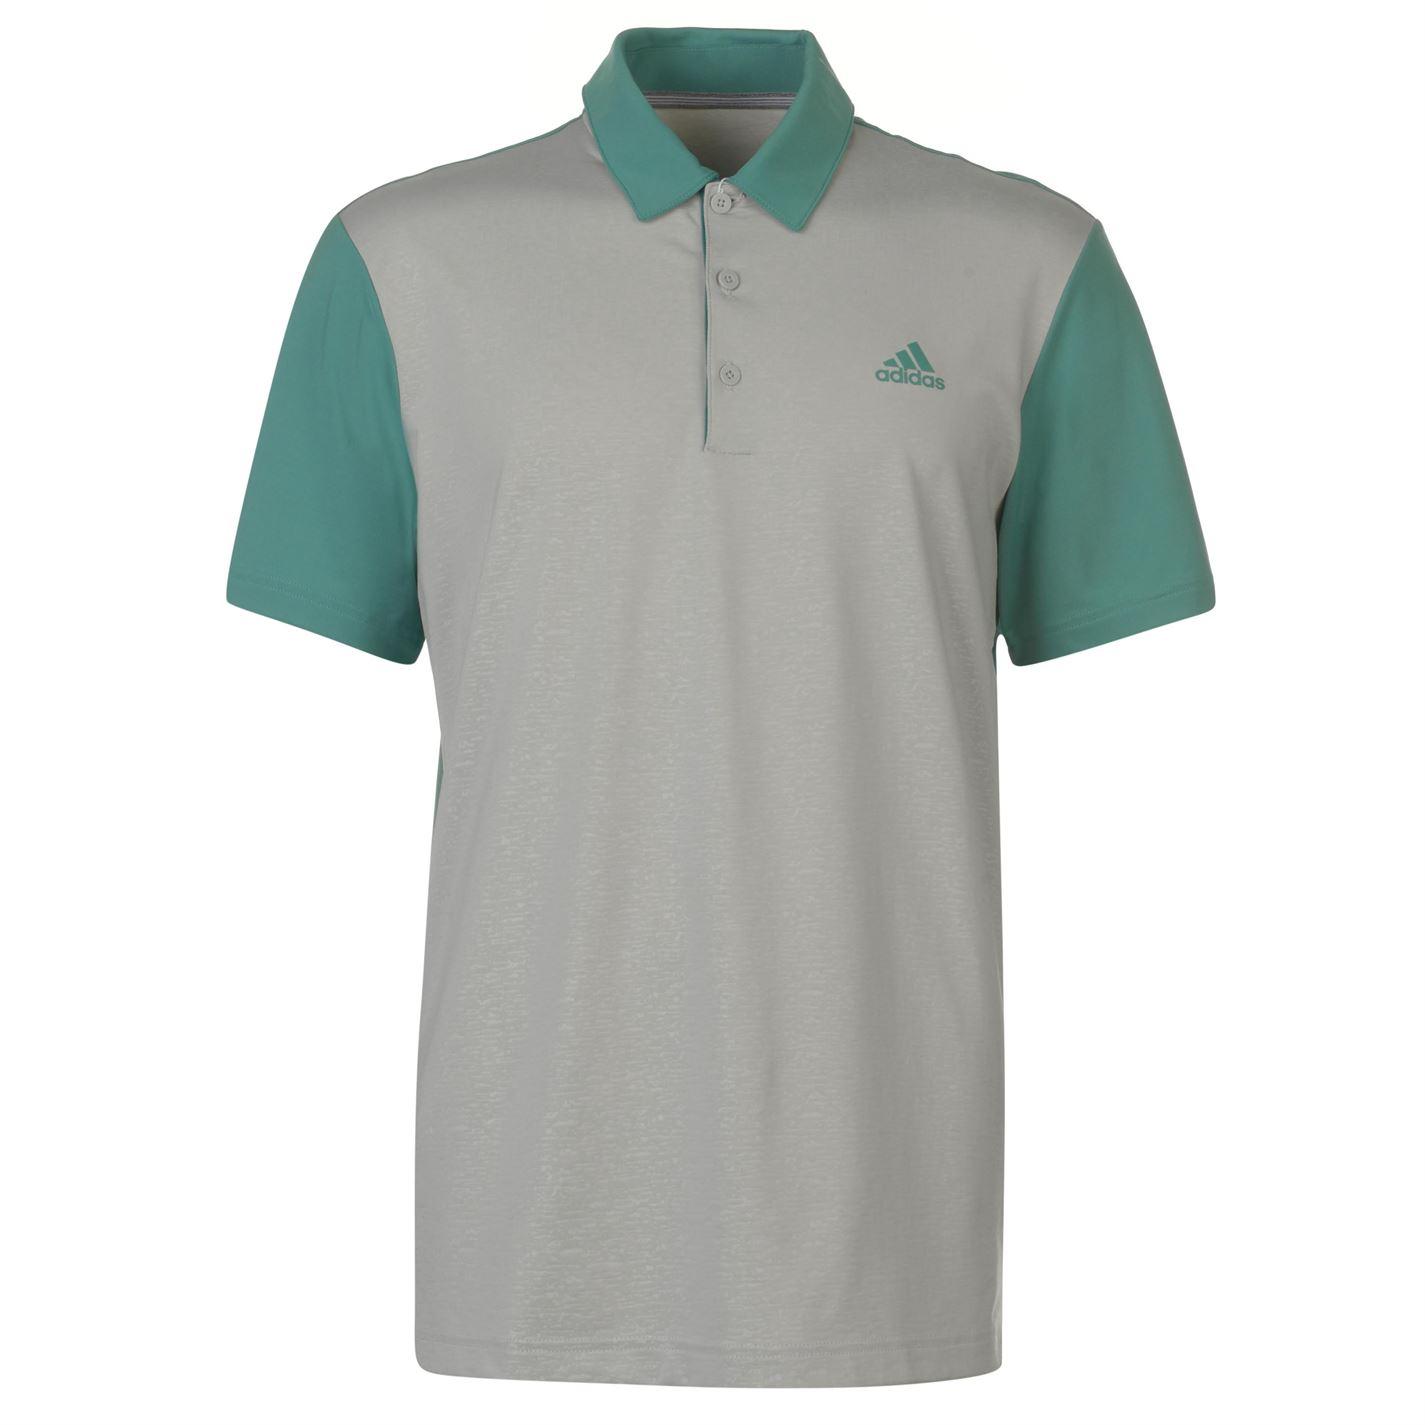 Adidas Camo Embroidered Polo Shirt Mens